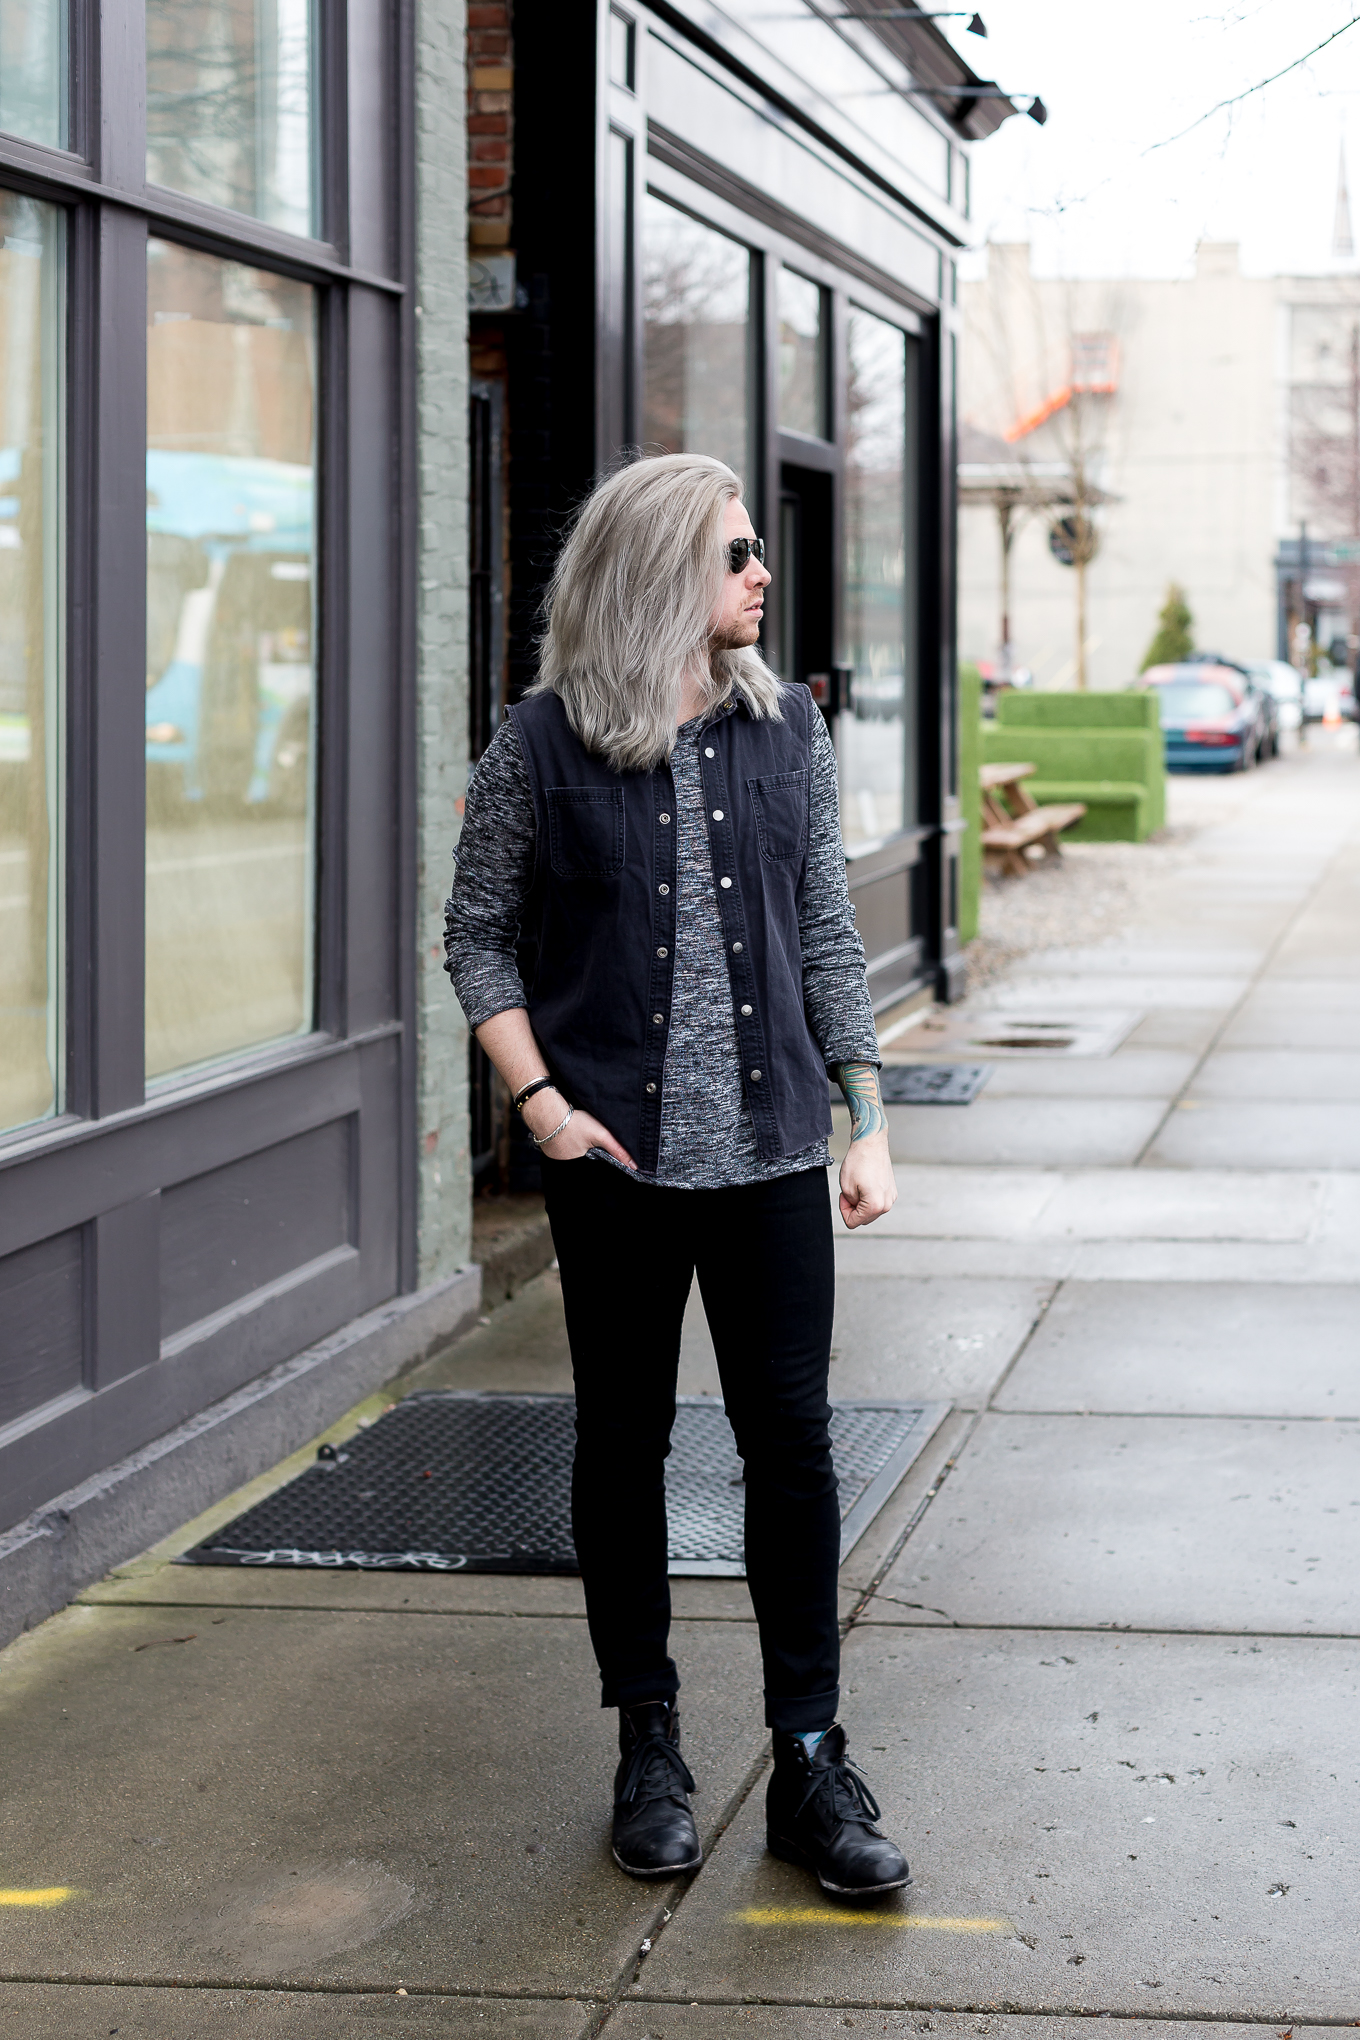 mens fashion, mens street style, mens fashion blogger, mens style blog